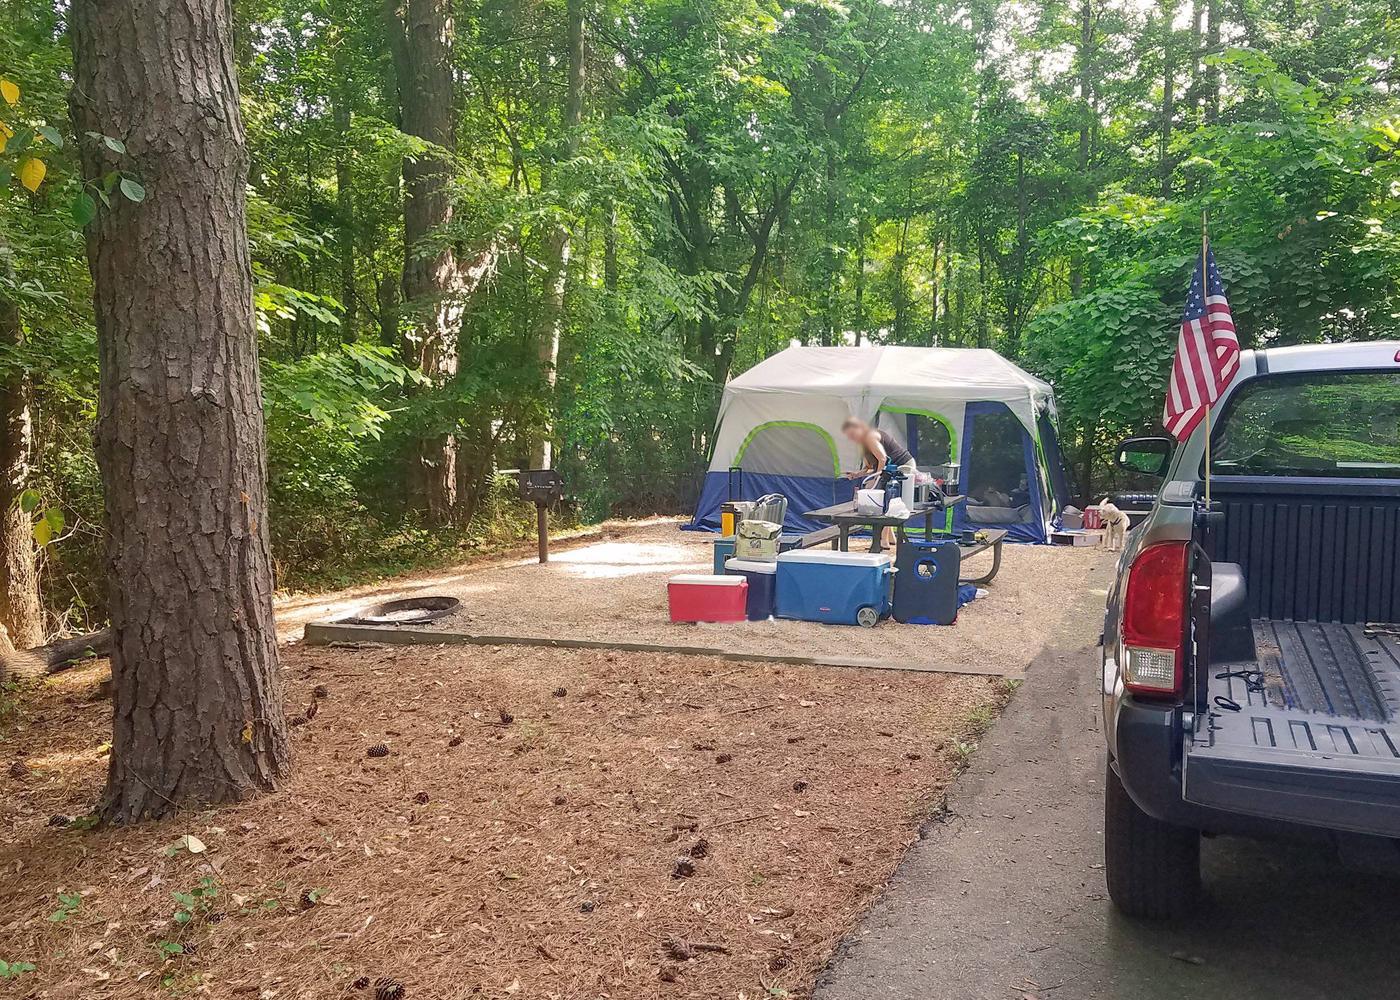 Campsite view.Victoria Campground, campsite 03.